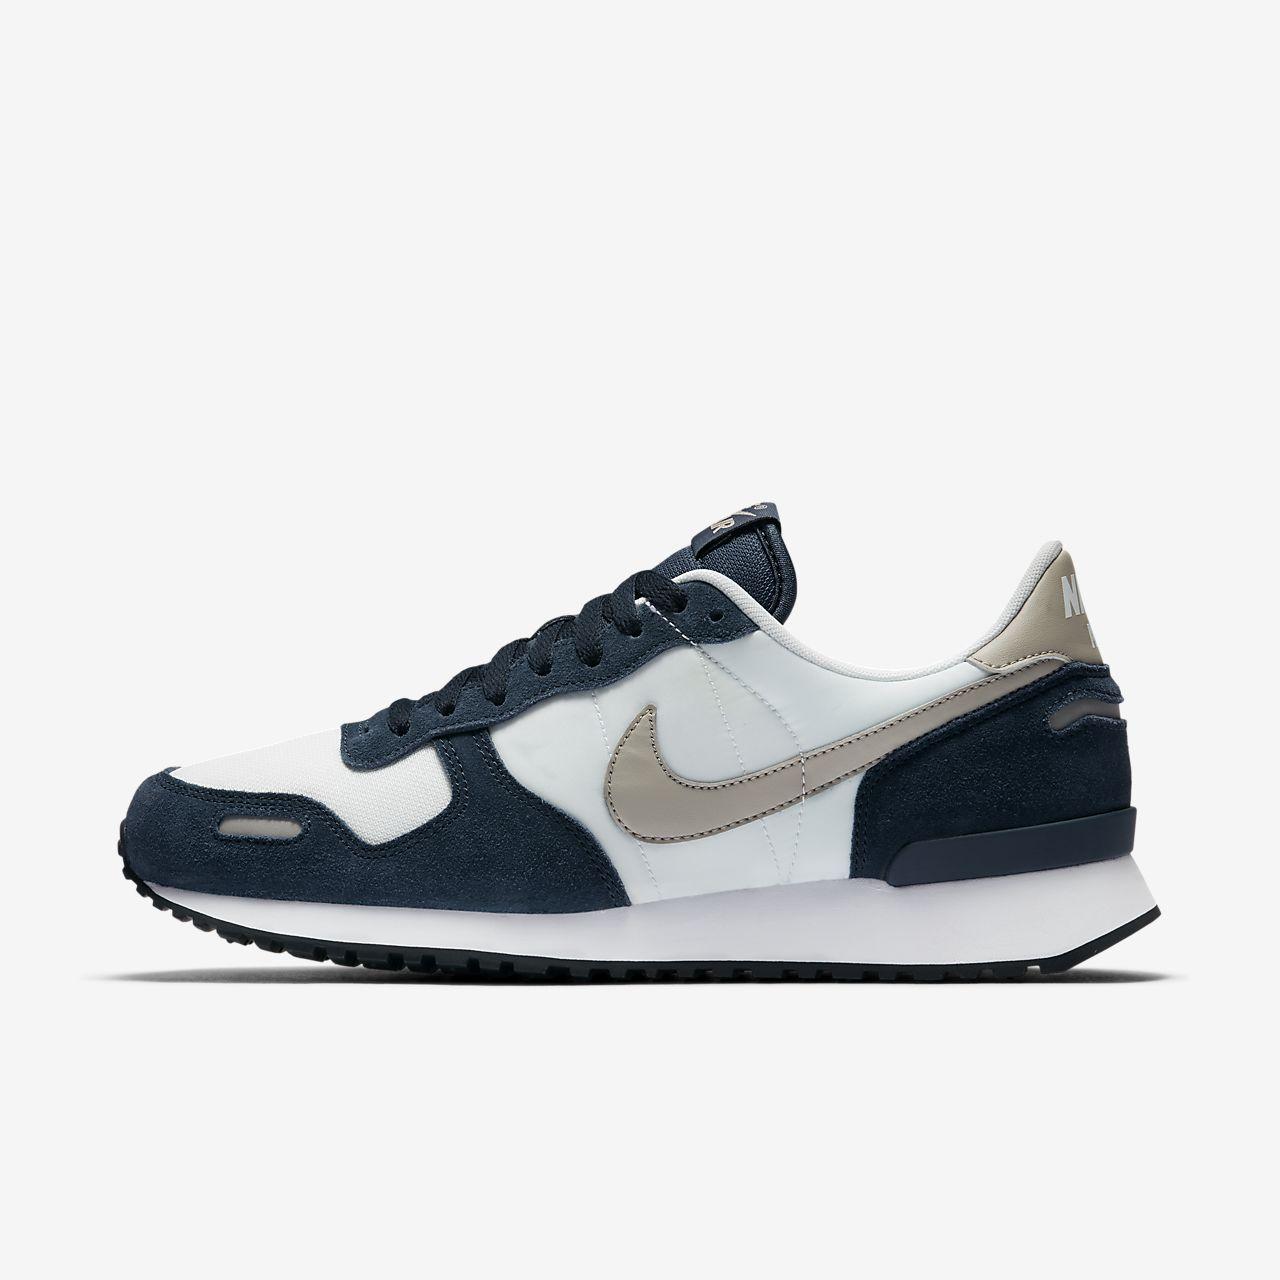 Nike Chaussure / Vortex D'air En Noir HpgsC